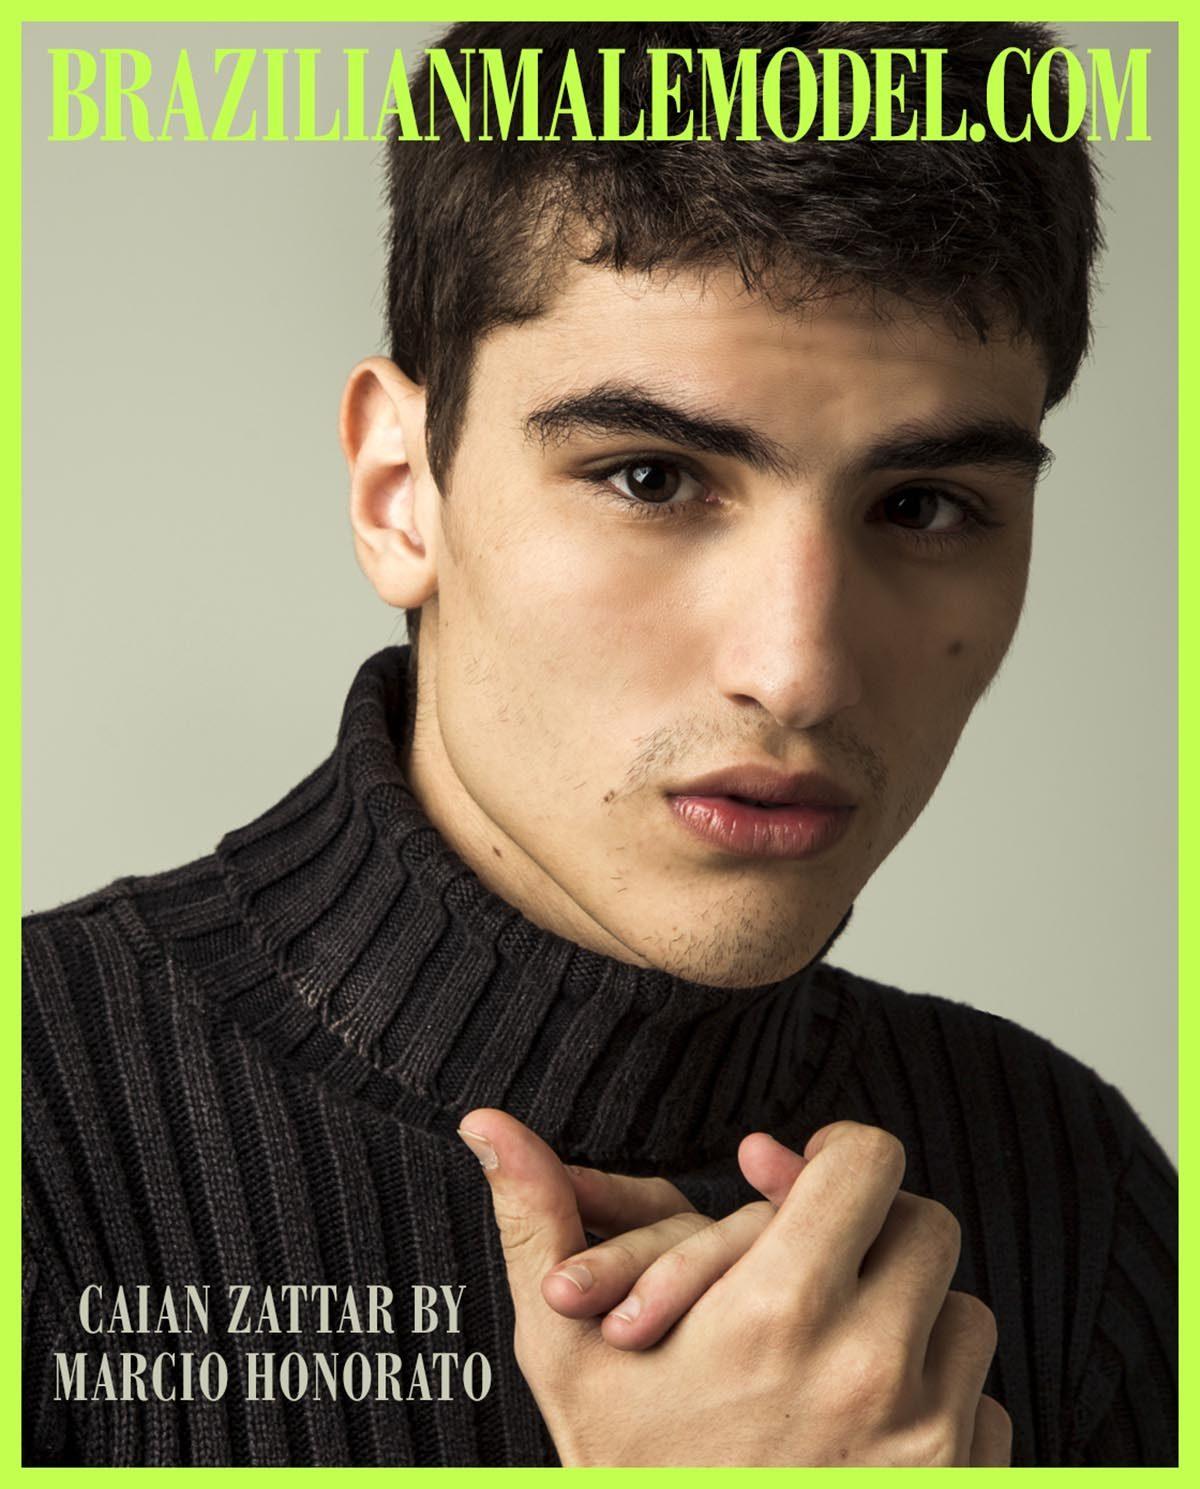 Caian Zattar by Marcio Honorato